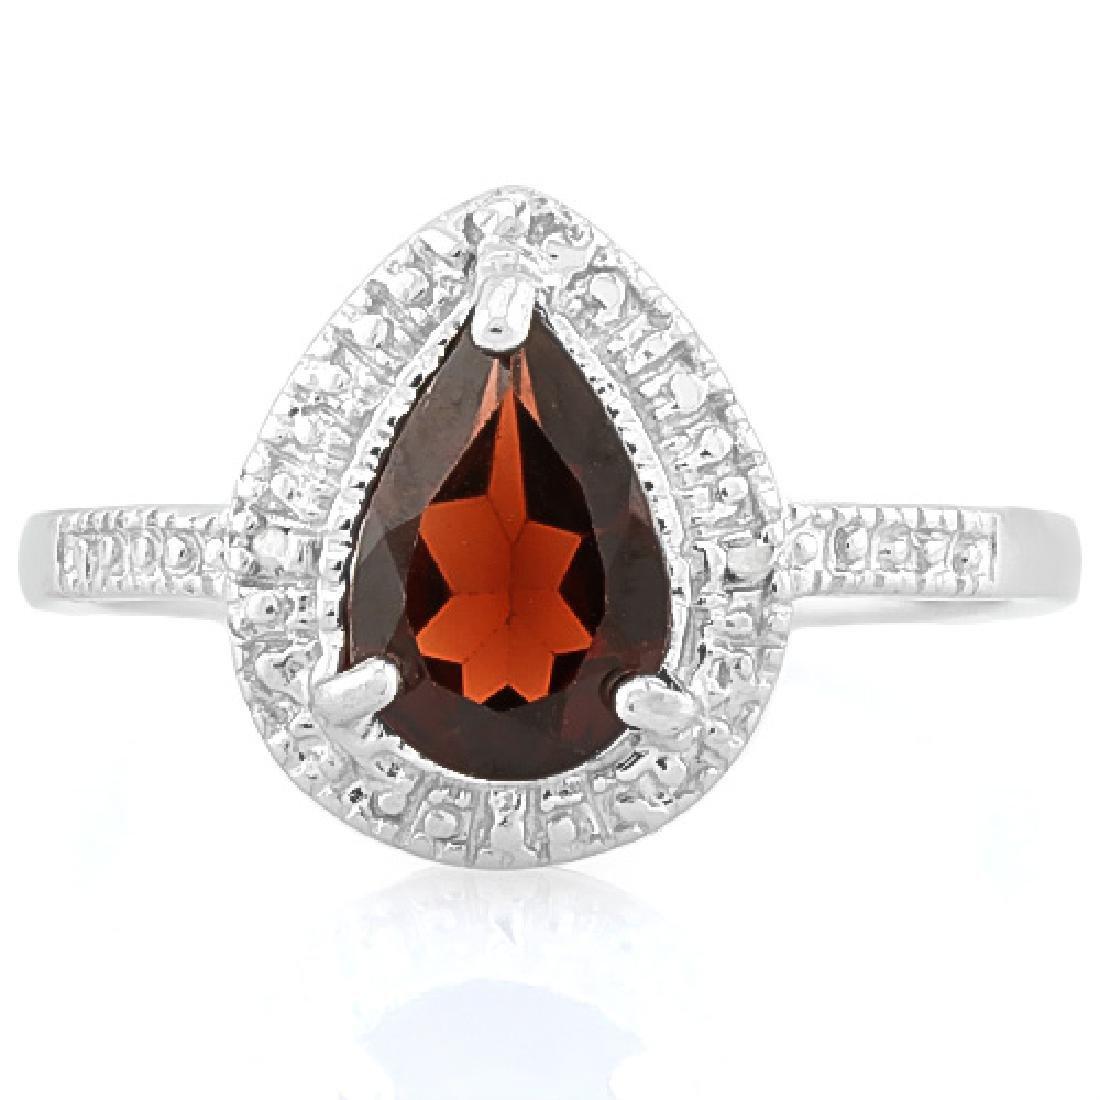 1 1/2 CARAT GARNET & DIAMOND 925 STERLING SILVER RING